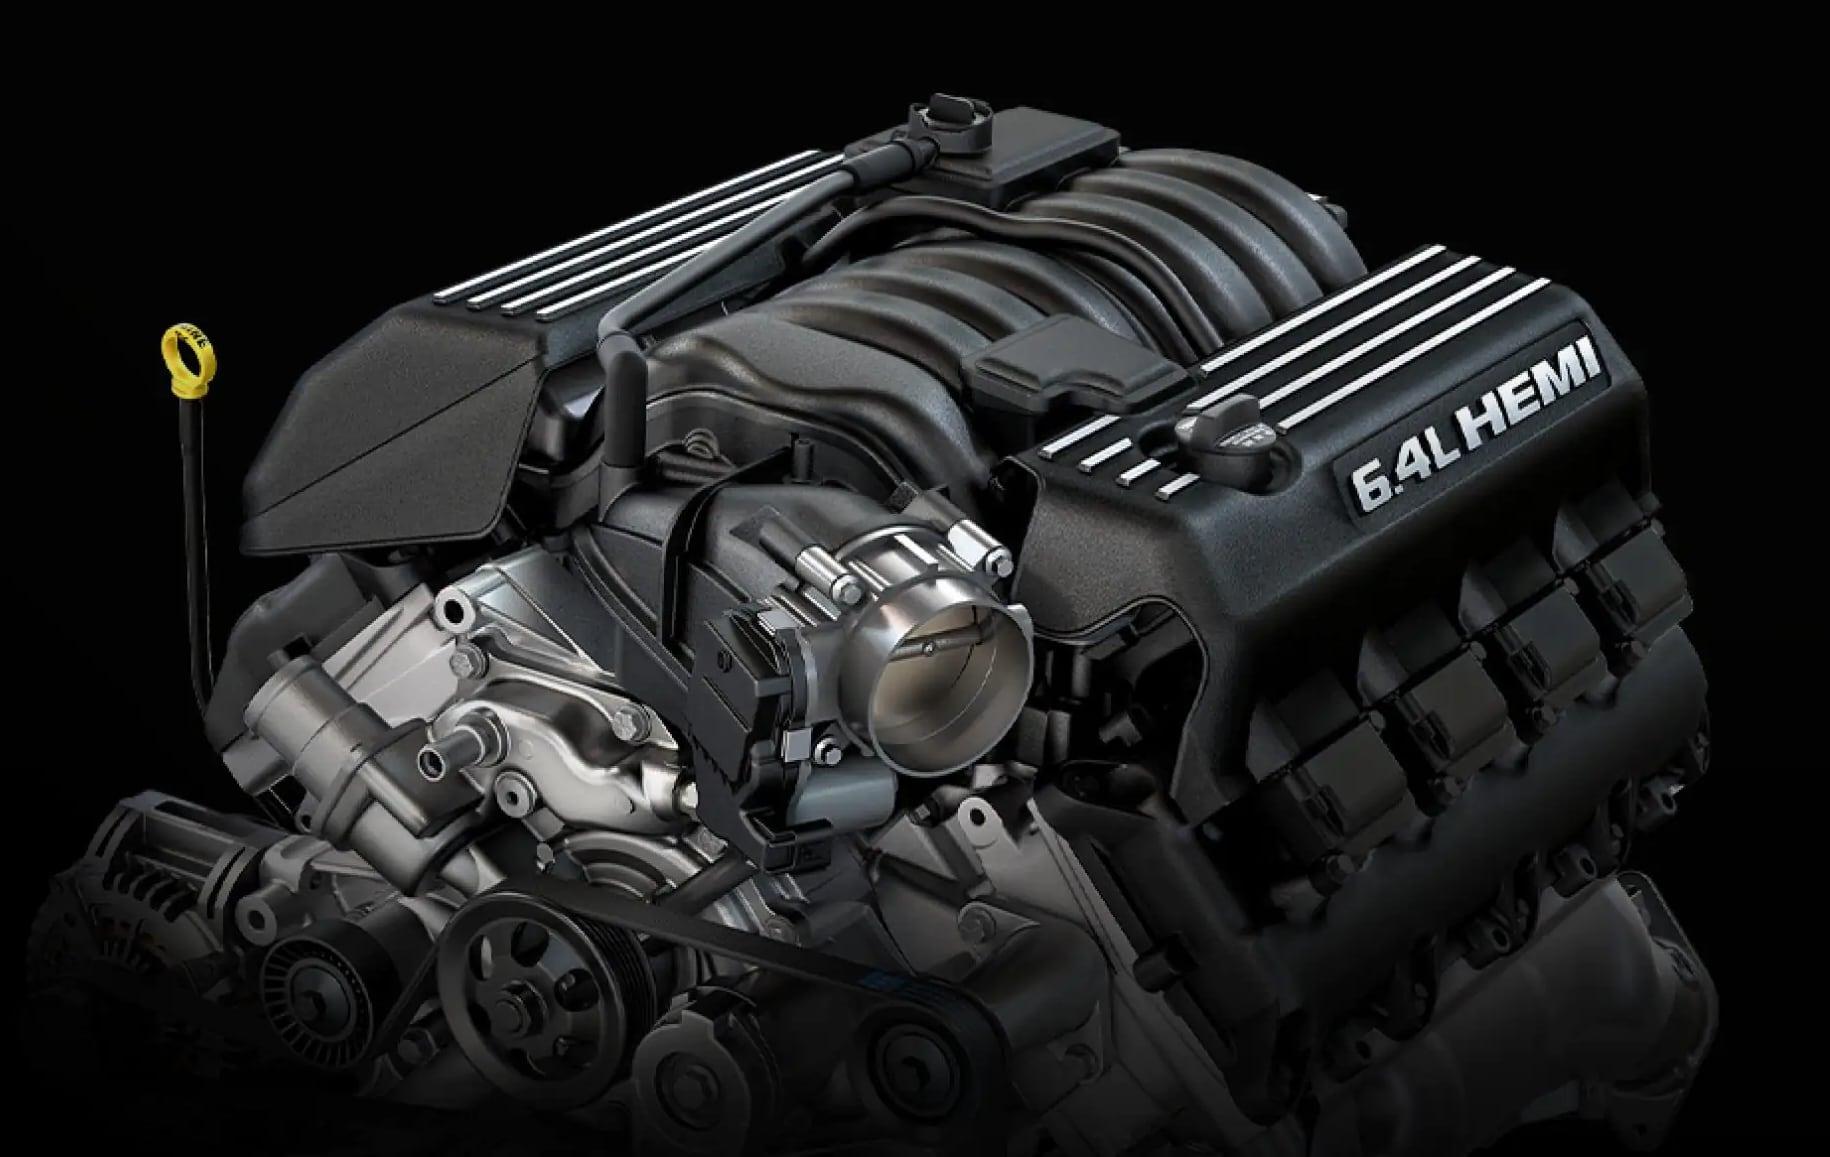 Close up of 6.4L Hemi V8 engine on black background